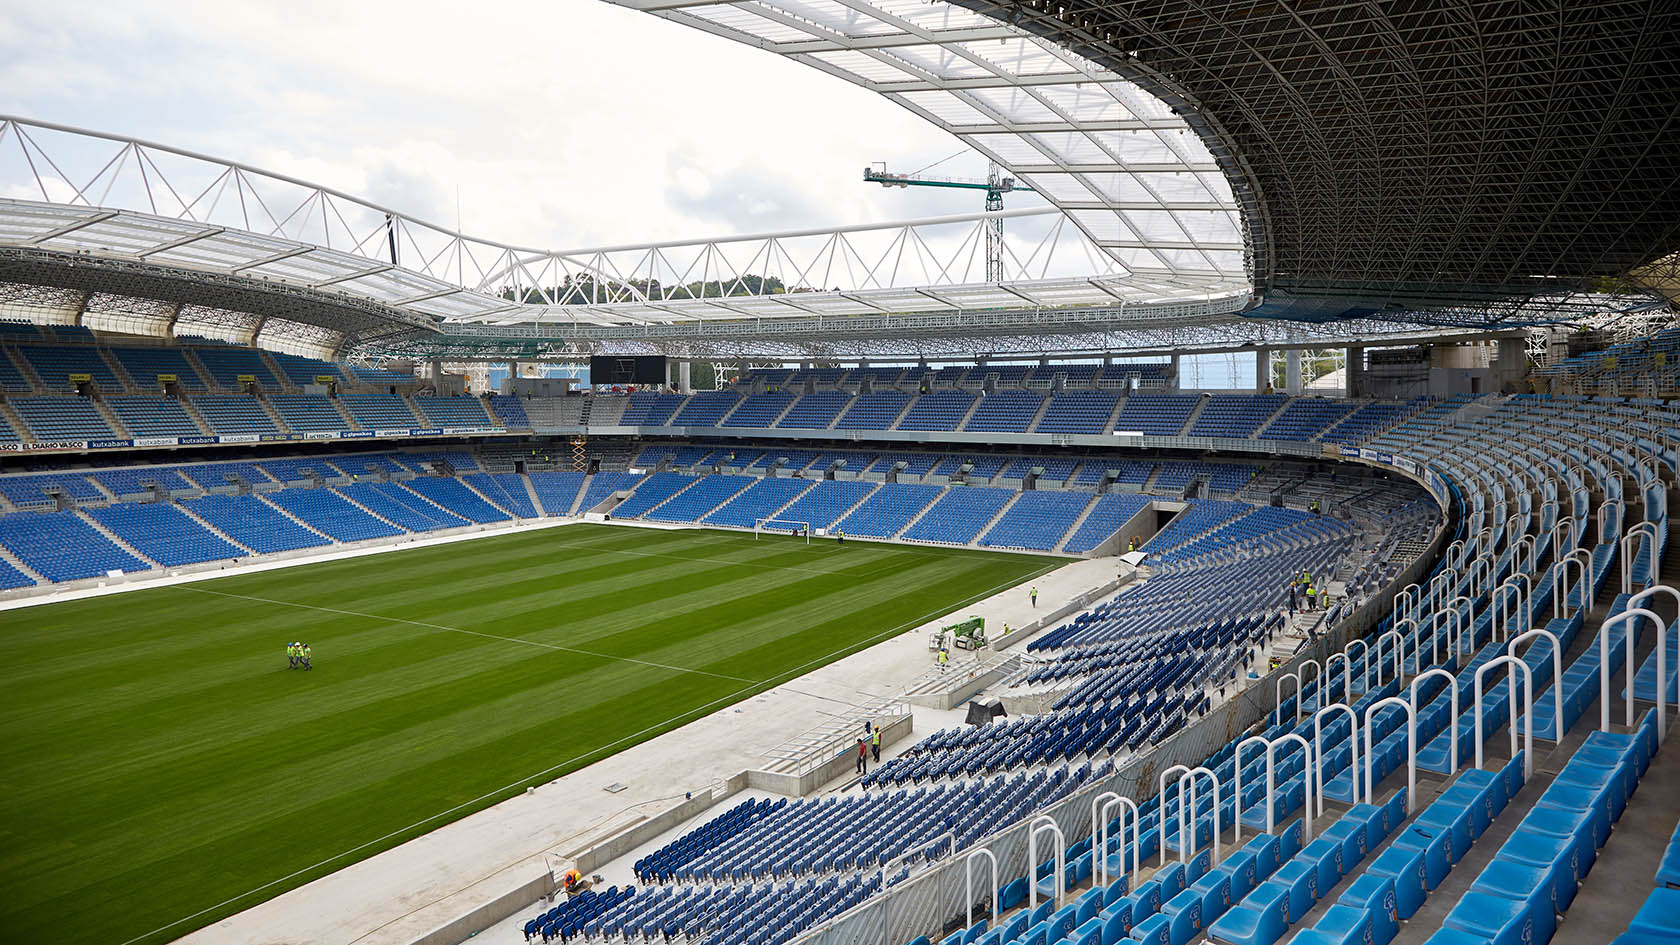 What a beautiful stadium